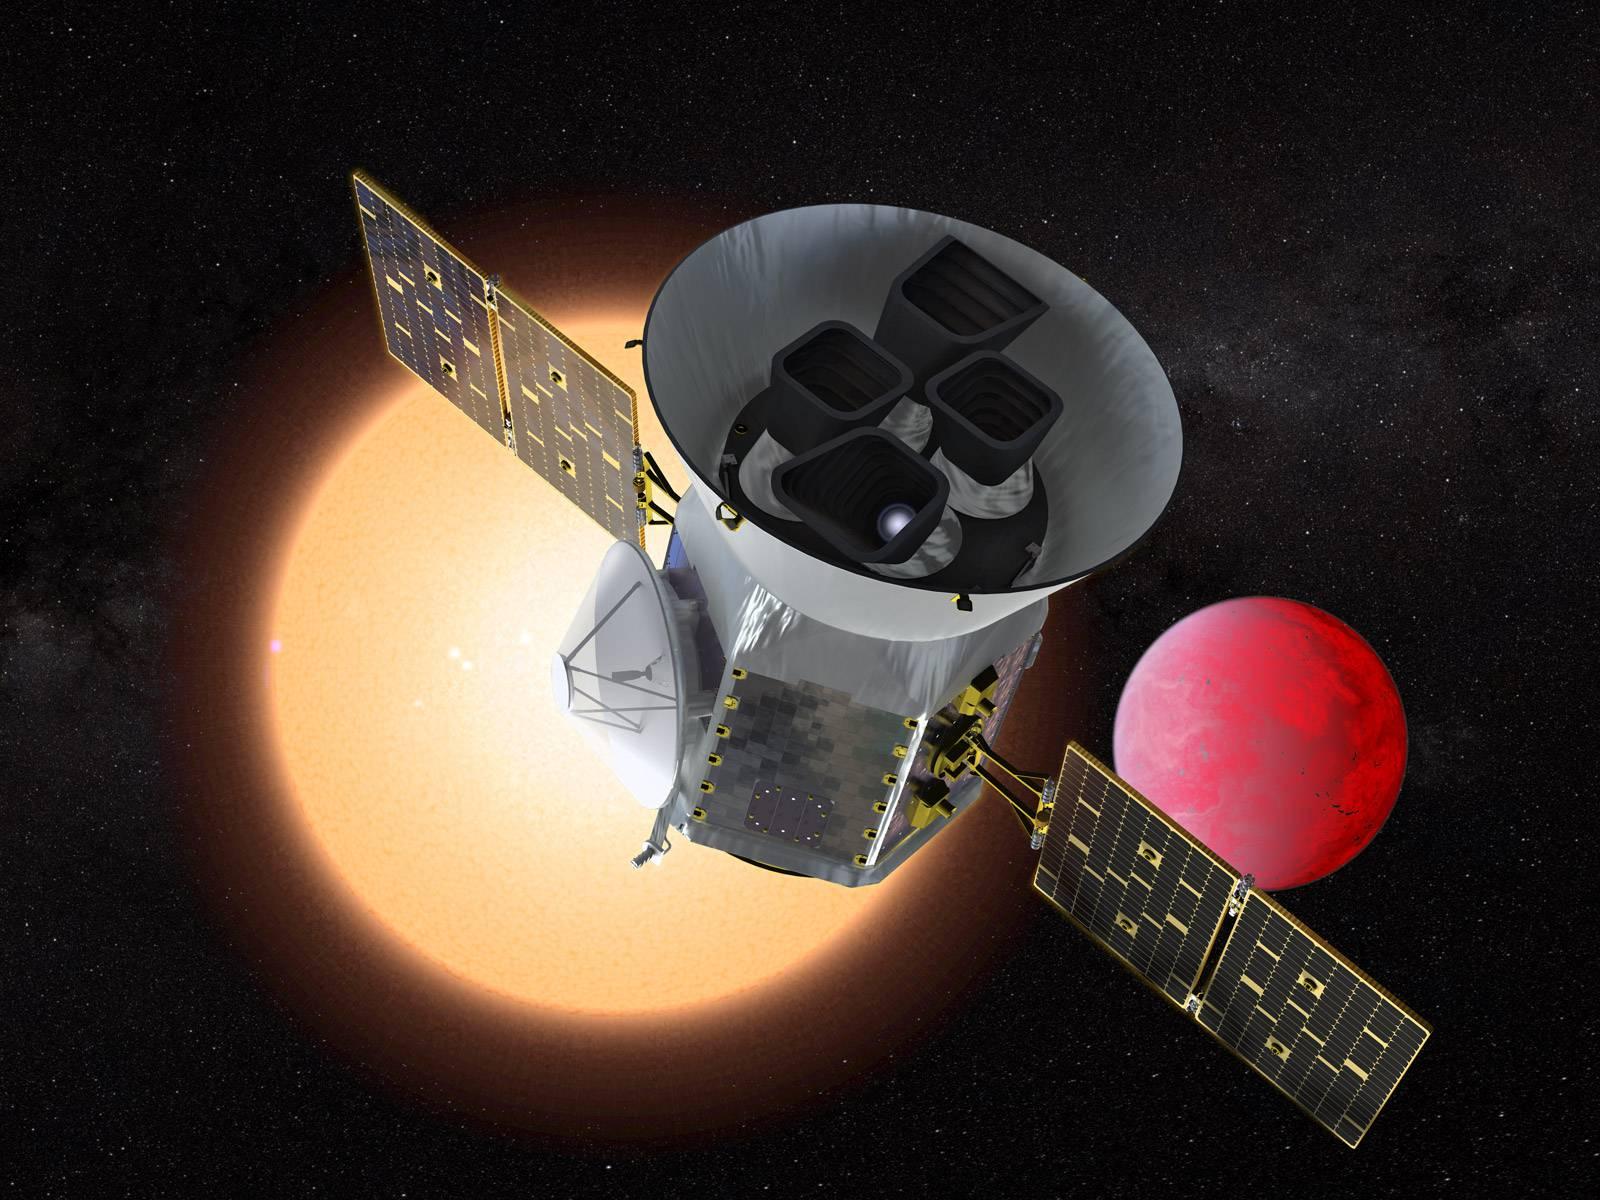 Kepler su poslali u san, ali Tess je spremna za lov na planete